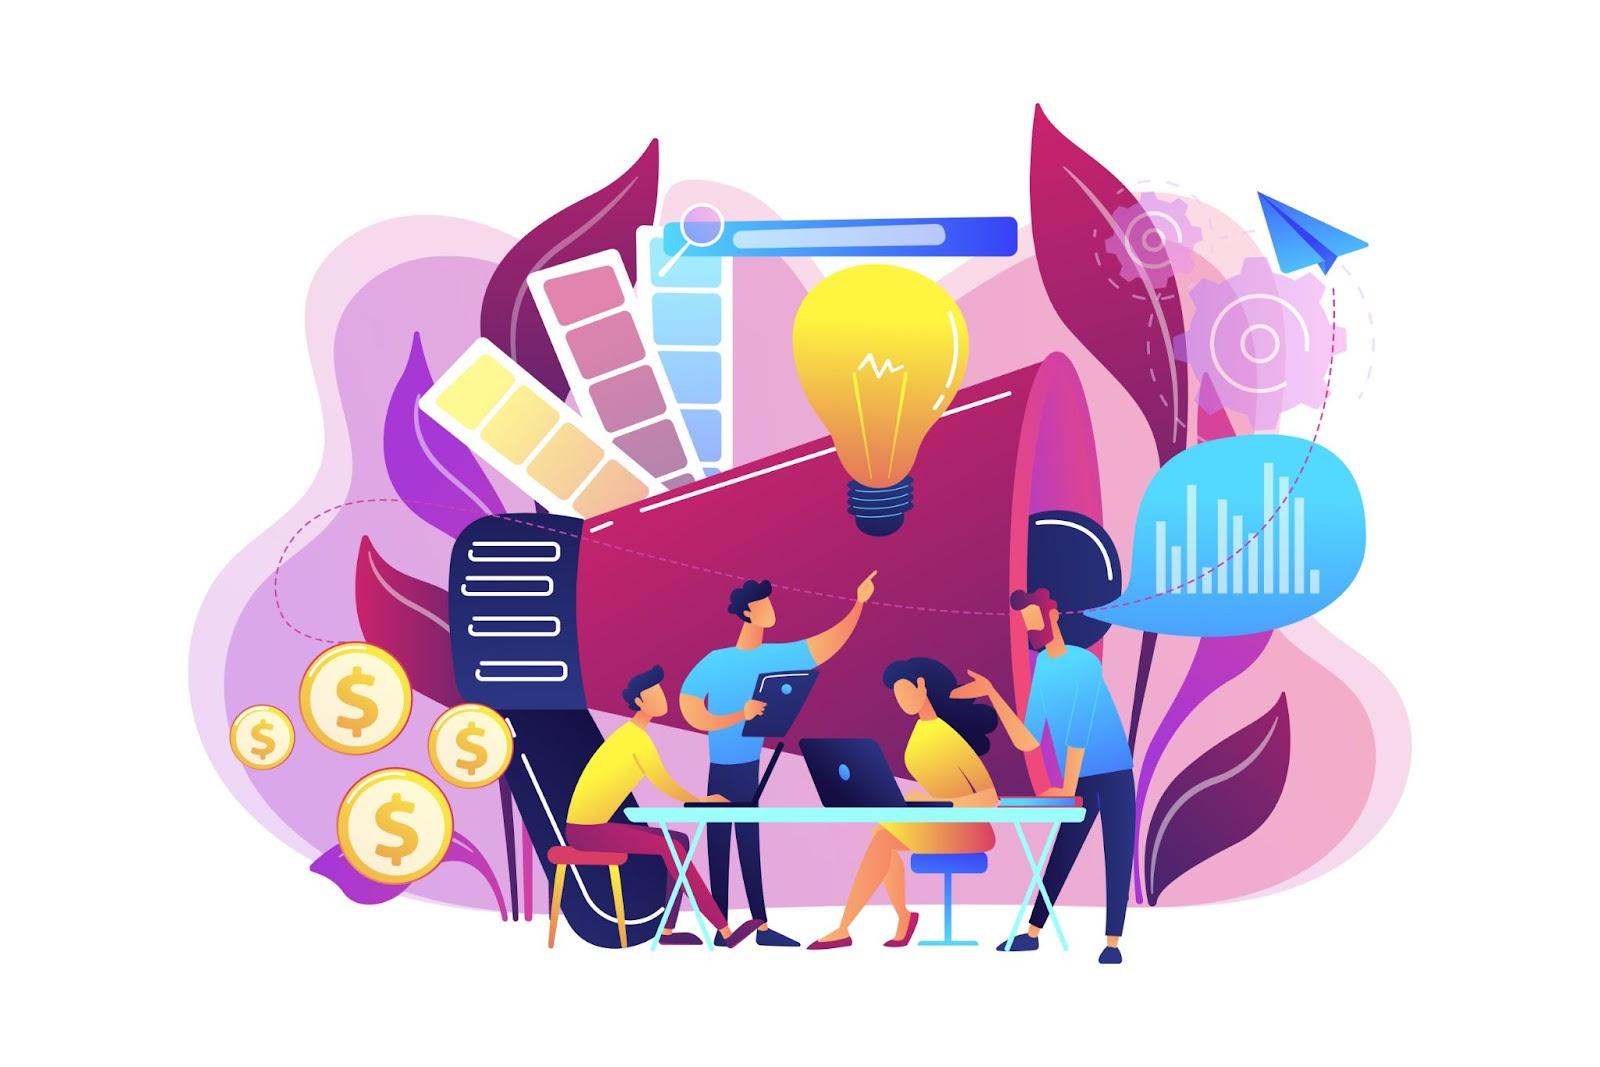 predictive analytics in Customer Service and Marketing